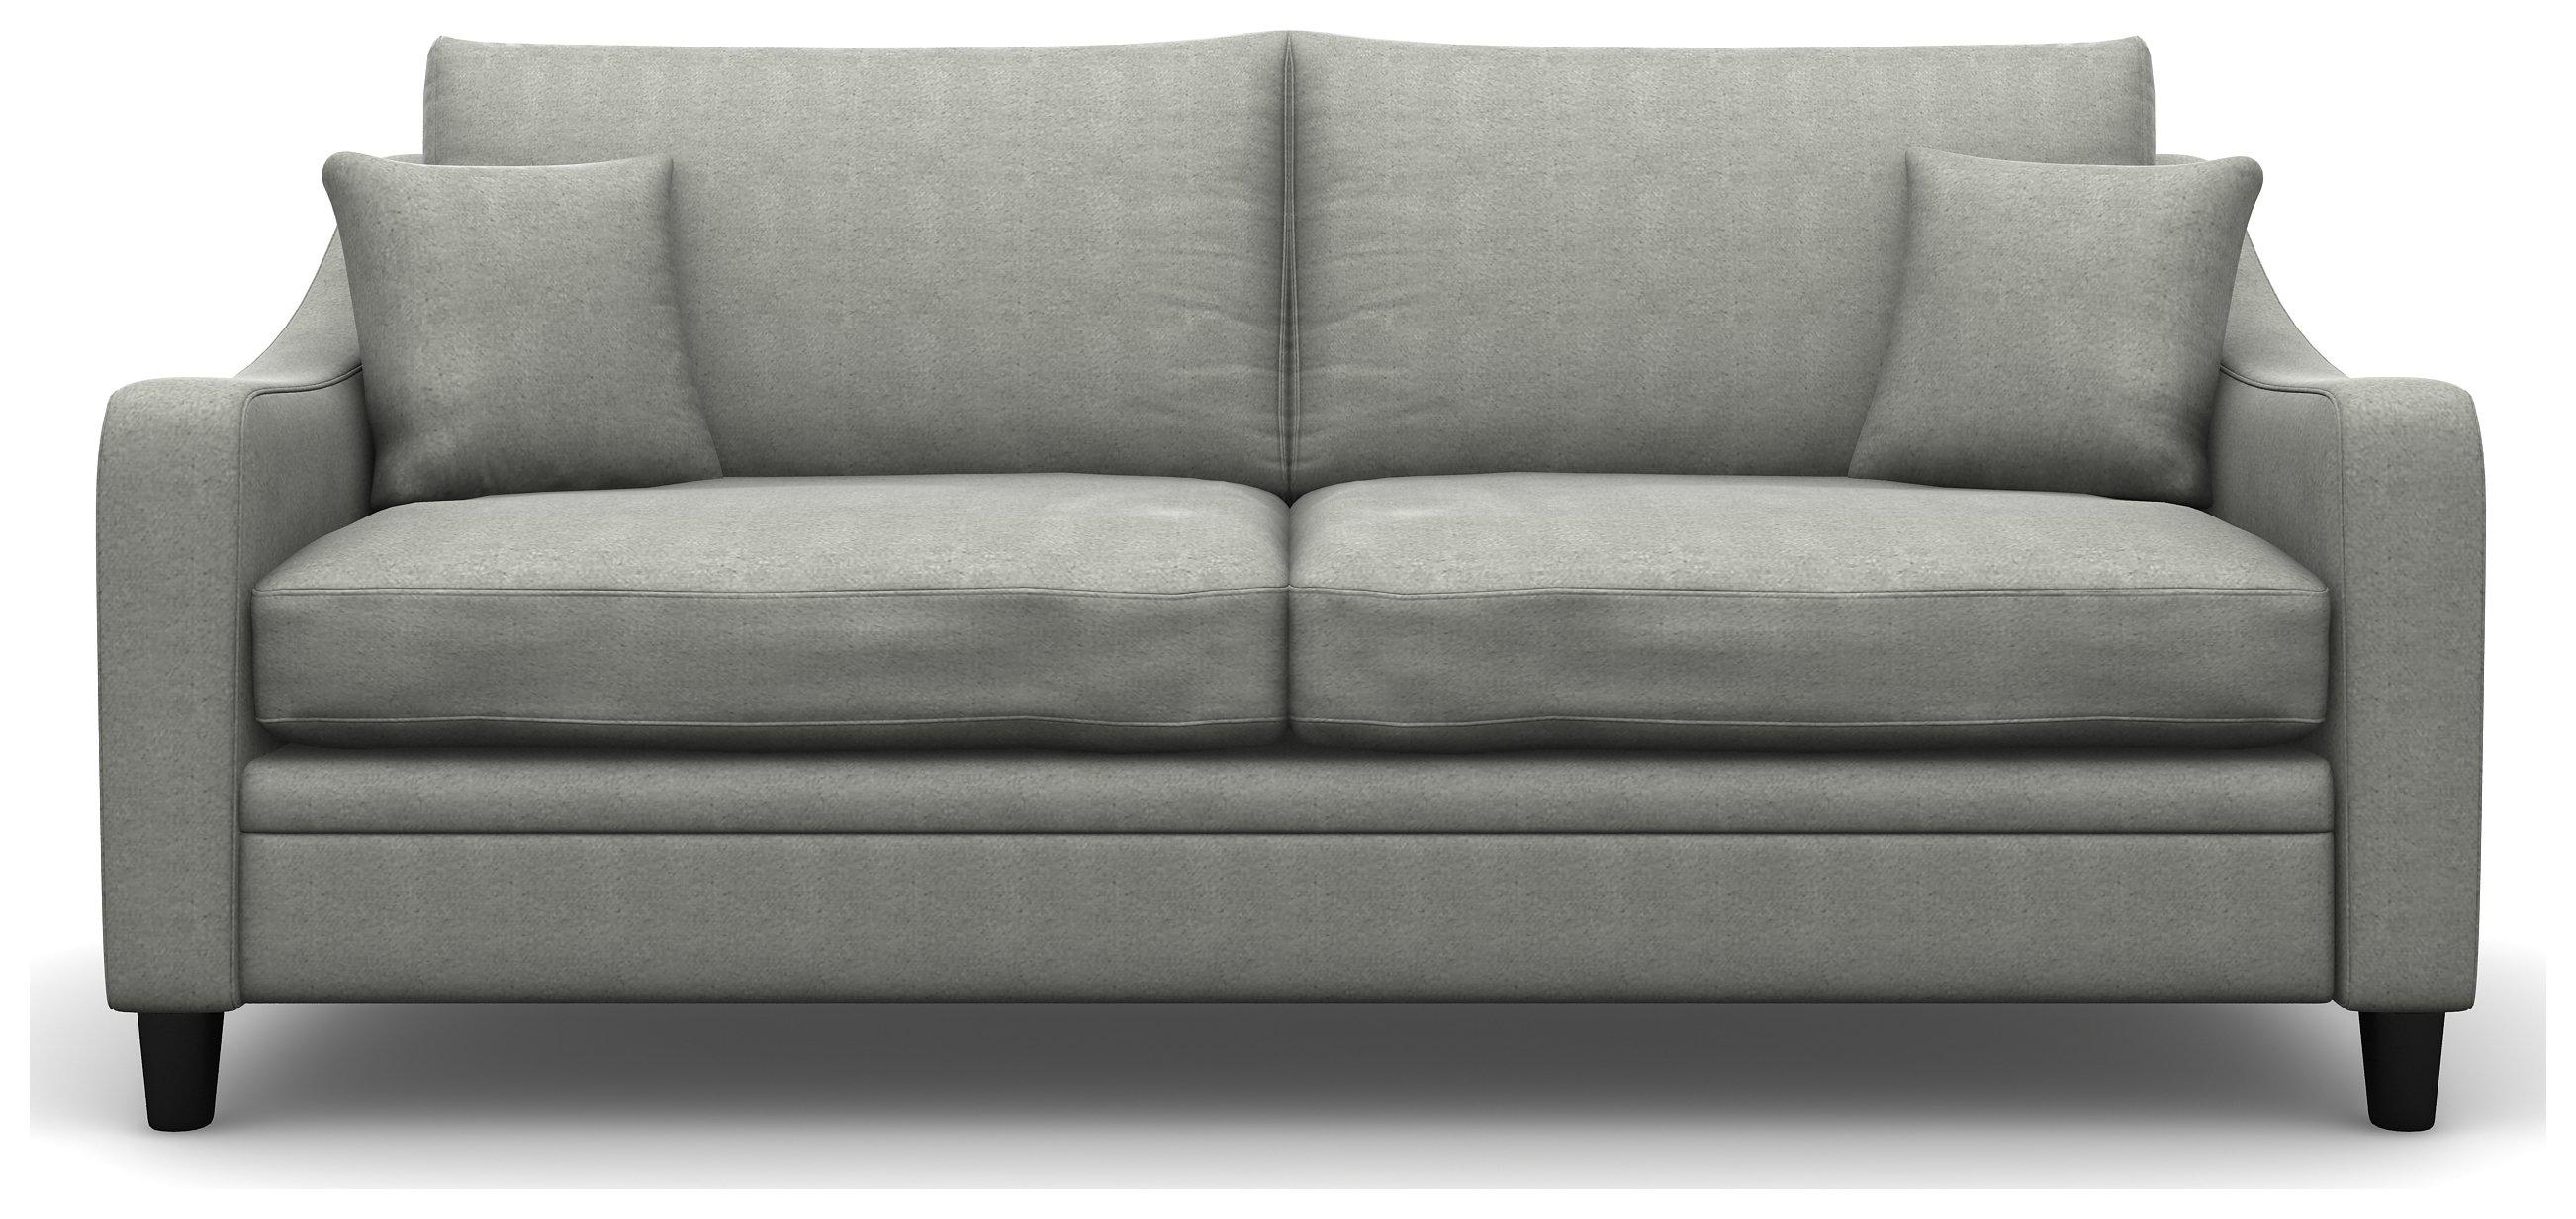 Heart of House Newbury 3 Seater Fabric Sofa - Grey.